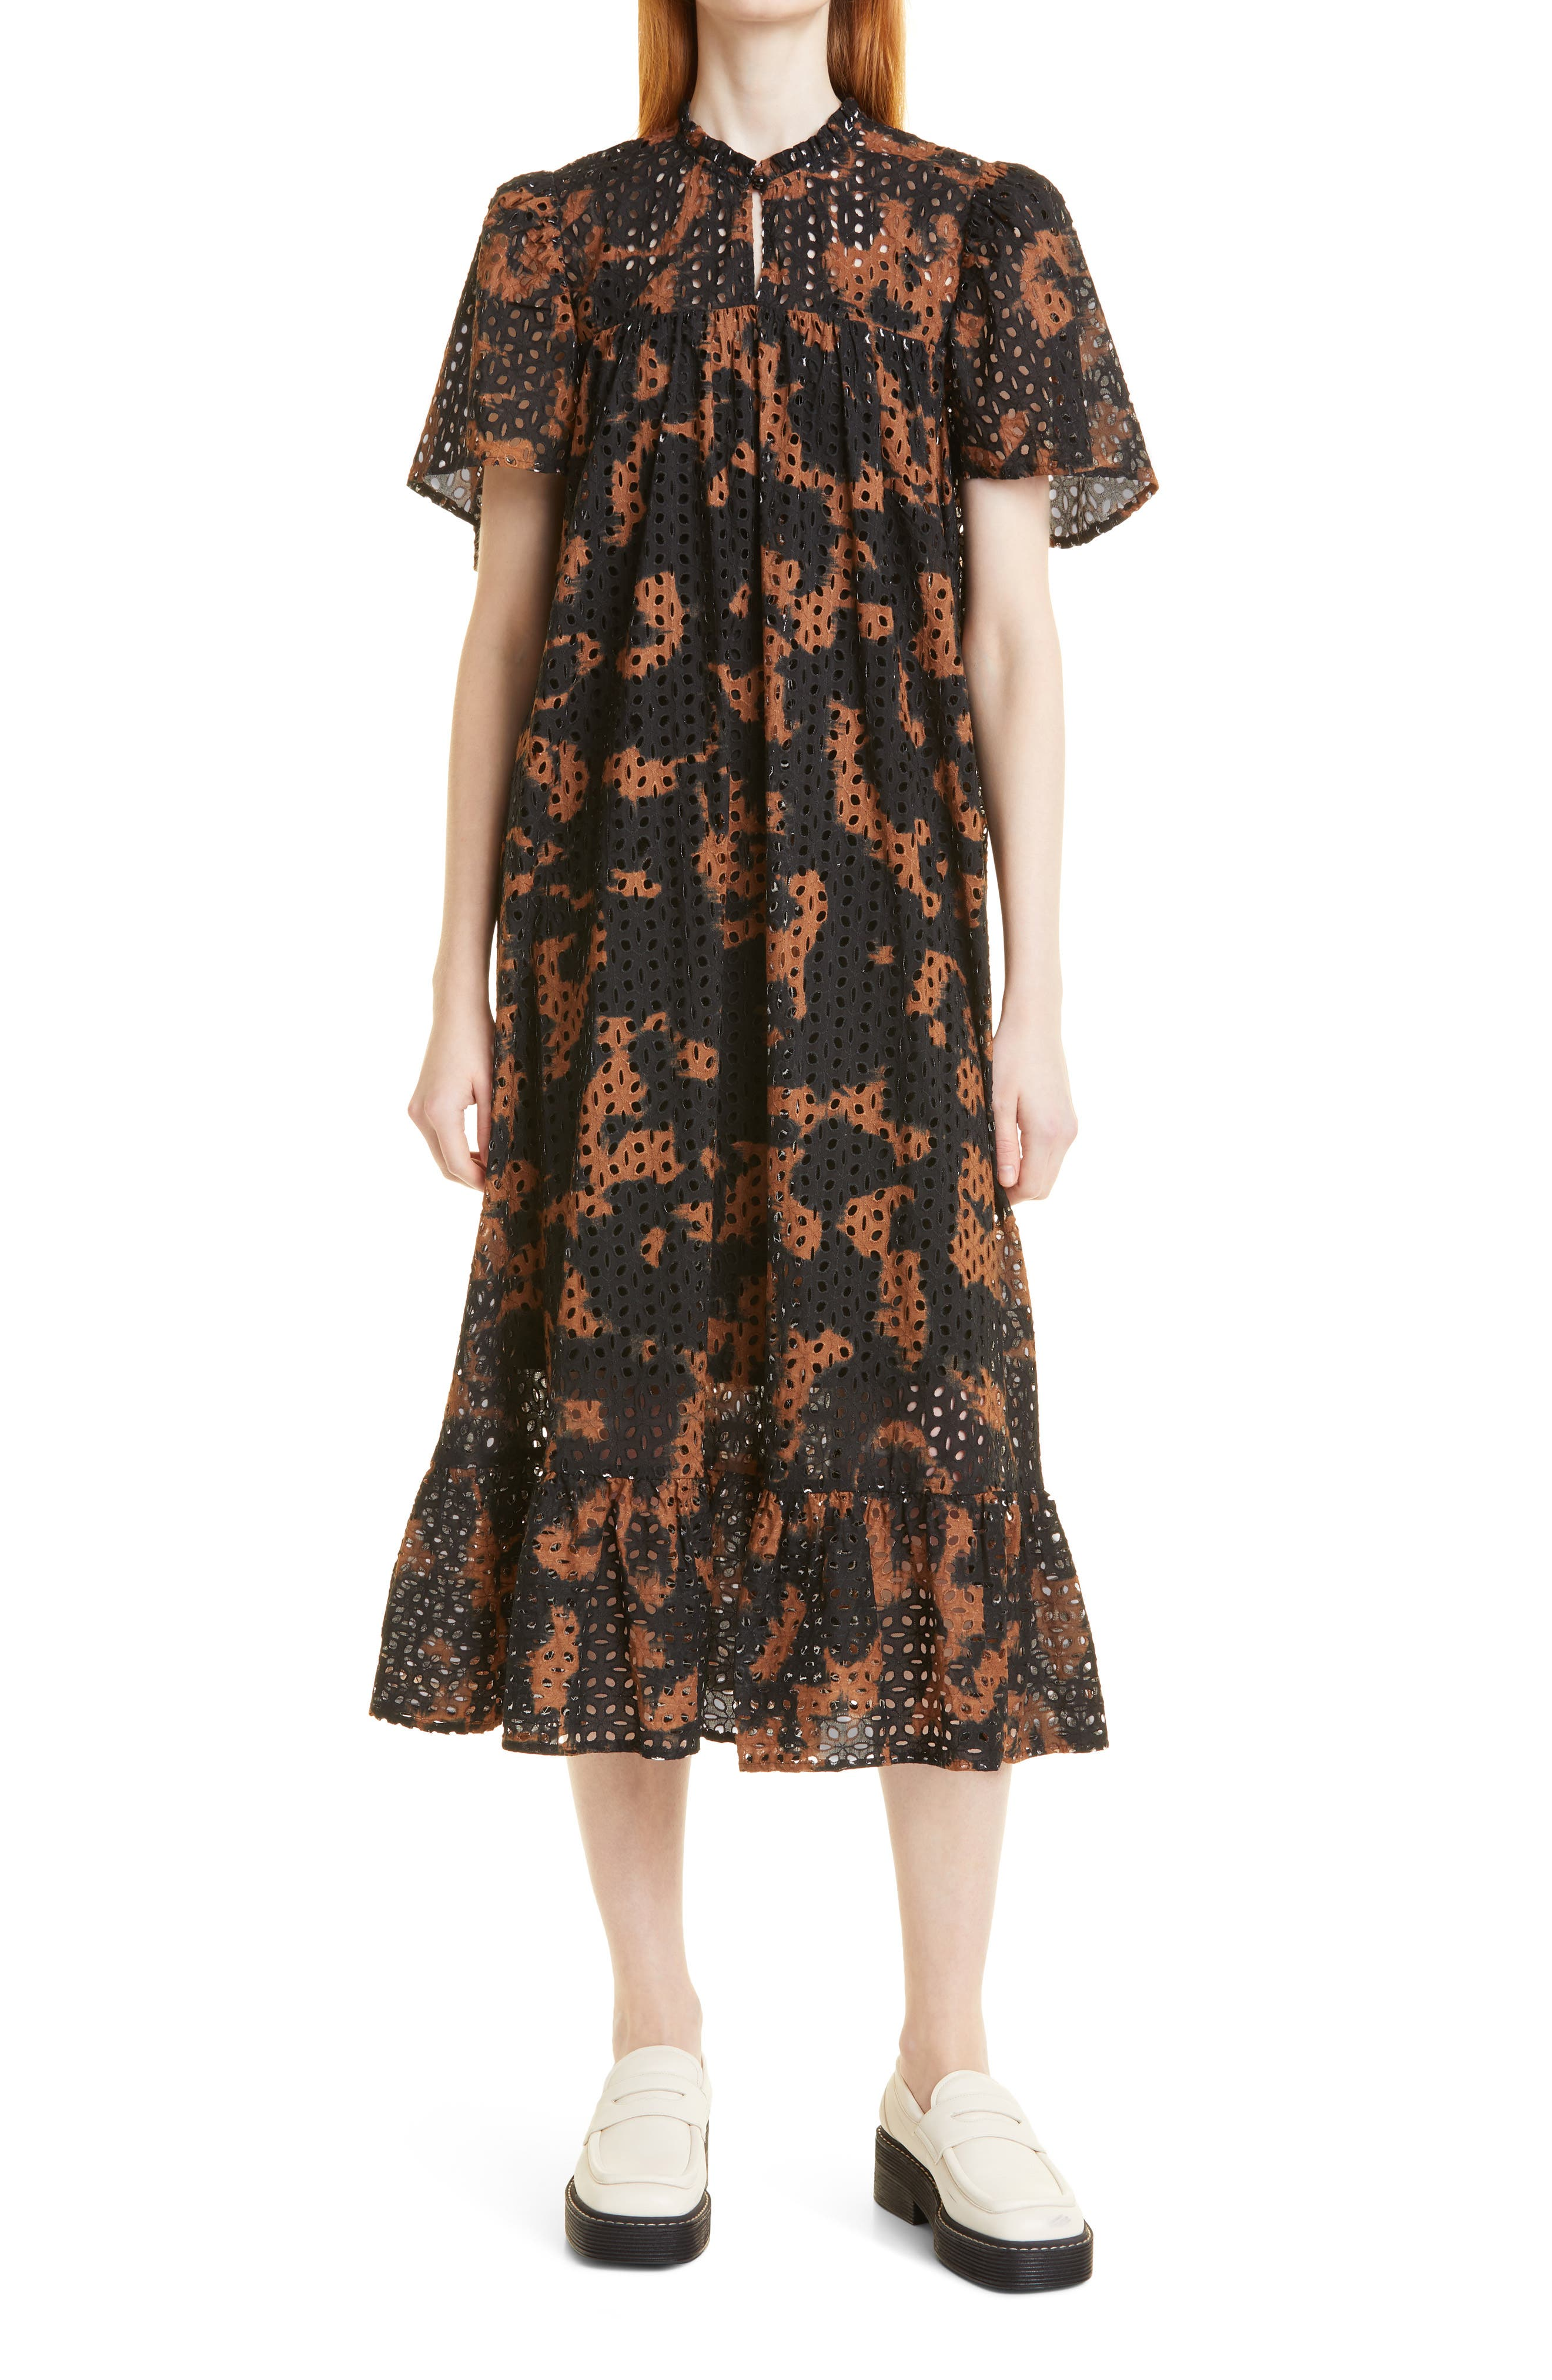 Reliz Tie Organic Cotton Eyelet Shift Midi Dress